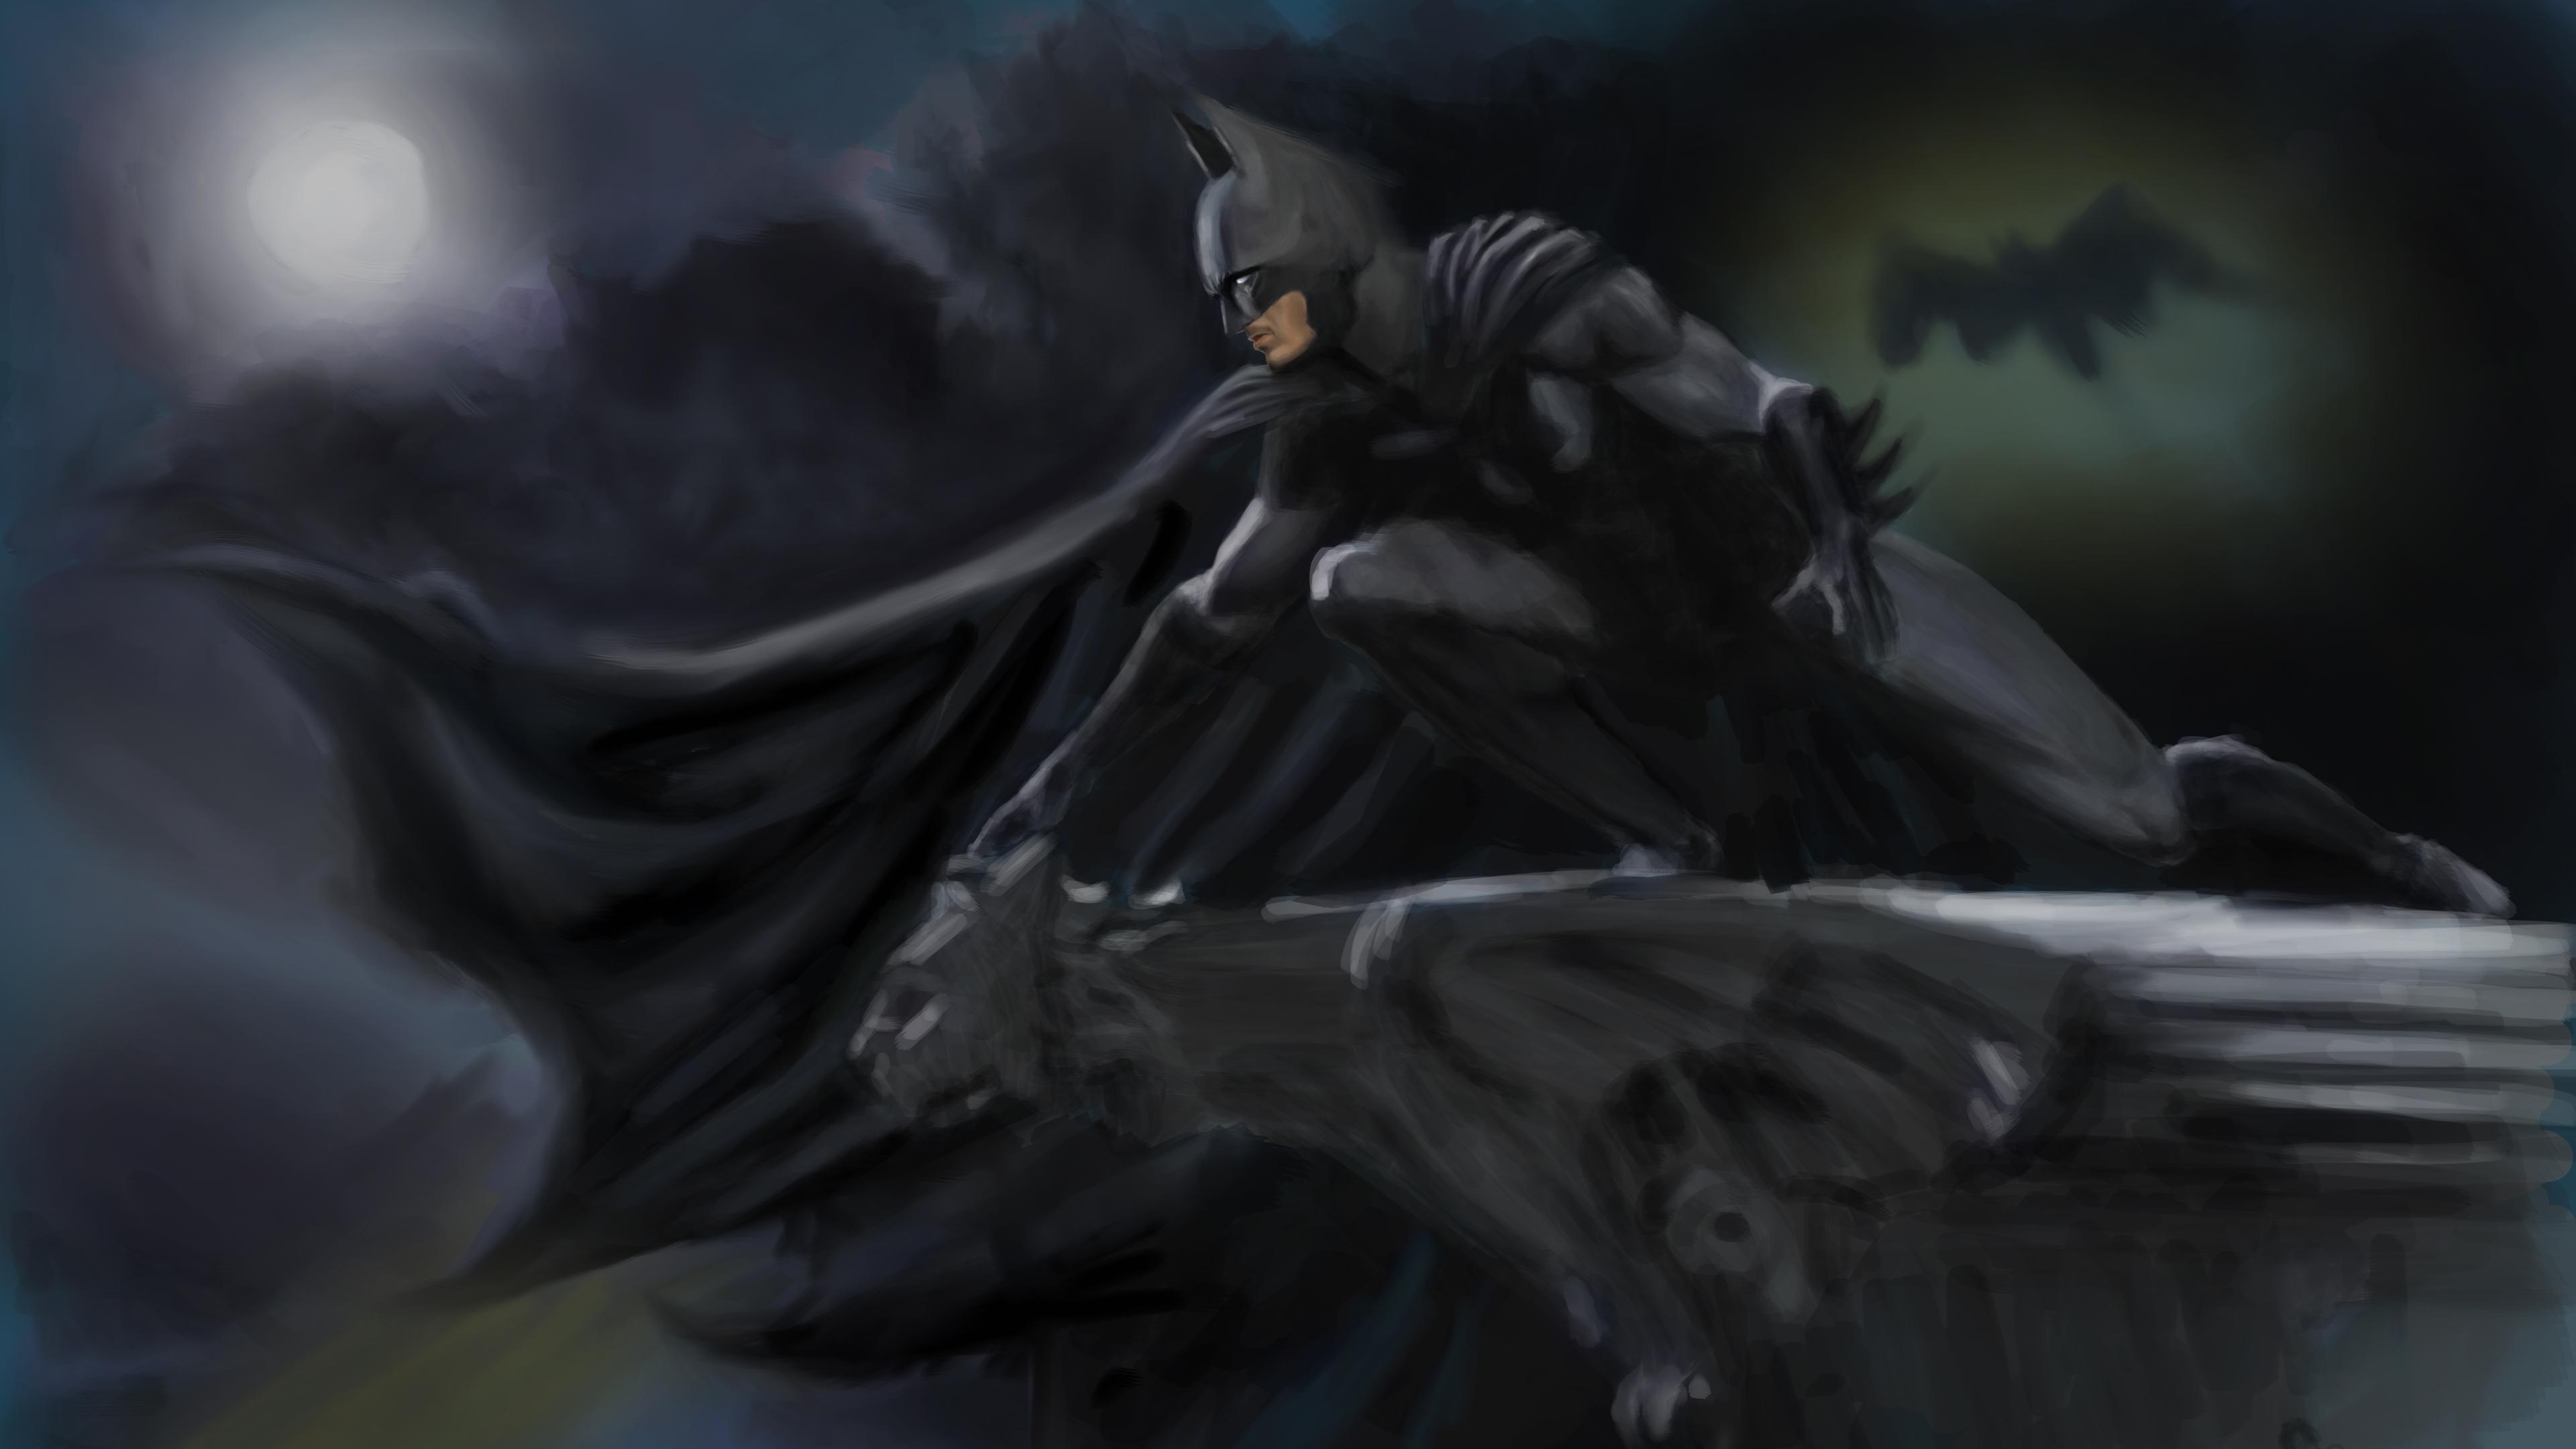 guardian of gotham 4k 1553071381 - Guardian Of Gotham 4k - superheroes wallpapers, hd-wallpapers, digital art wallpapers, deviantart wallpapers, batman wallpapers, artwork wallpapers, 8k wallpapers, 5k wallpapers, 4k-wallpapers